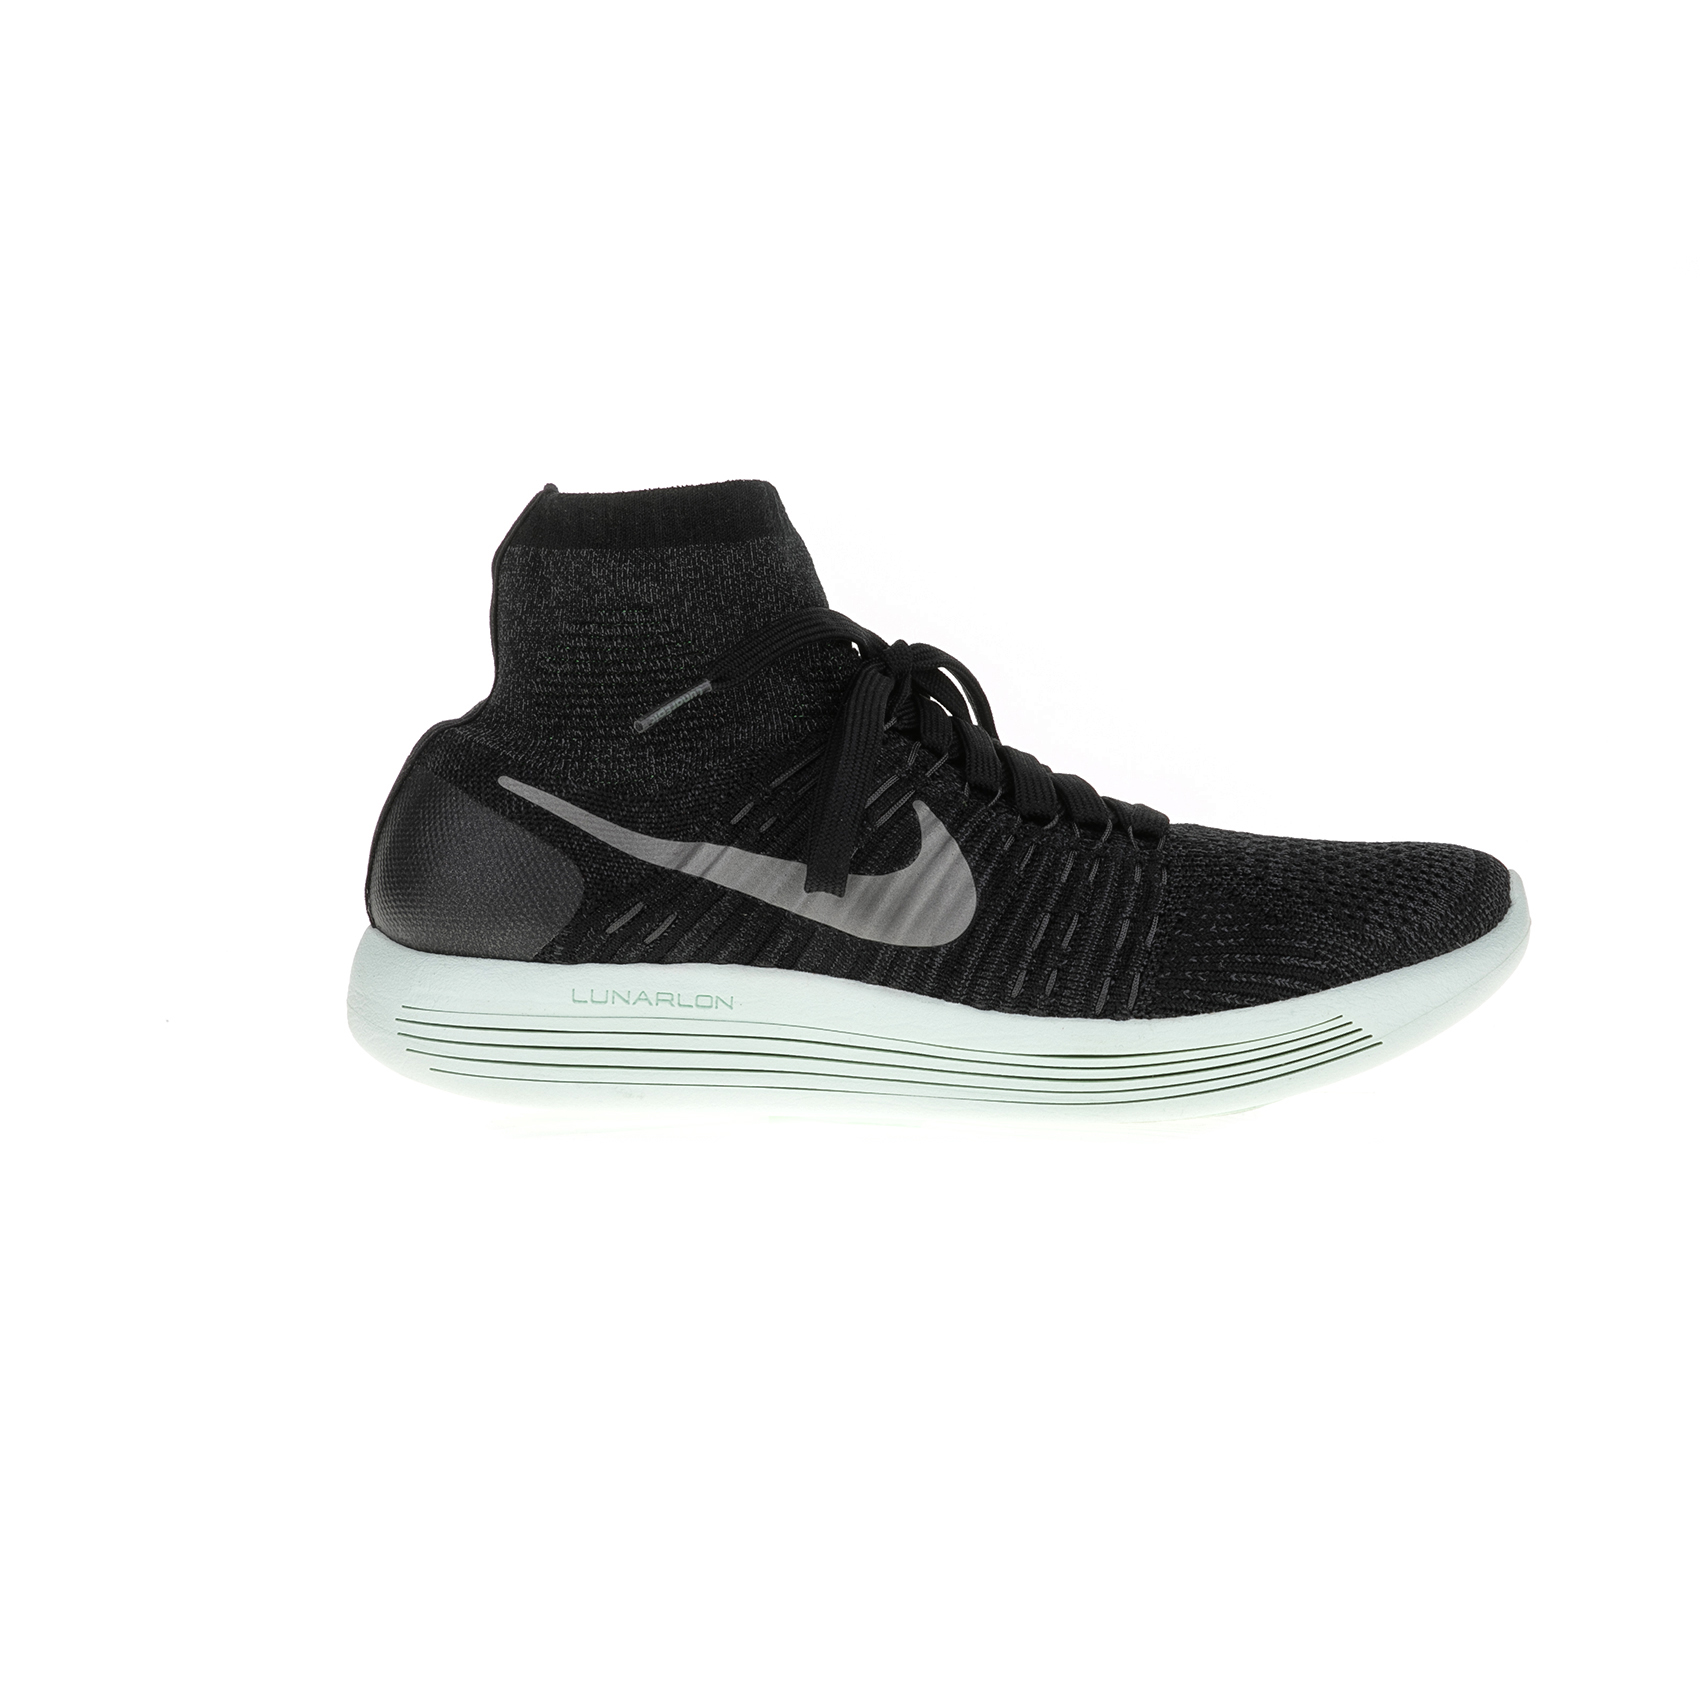 NIKE – Ανδρικά παπούτσια NIKE LUNAREPIC FLYKNIT μαύρα